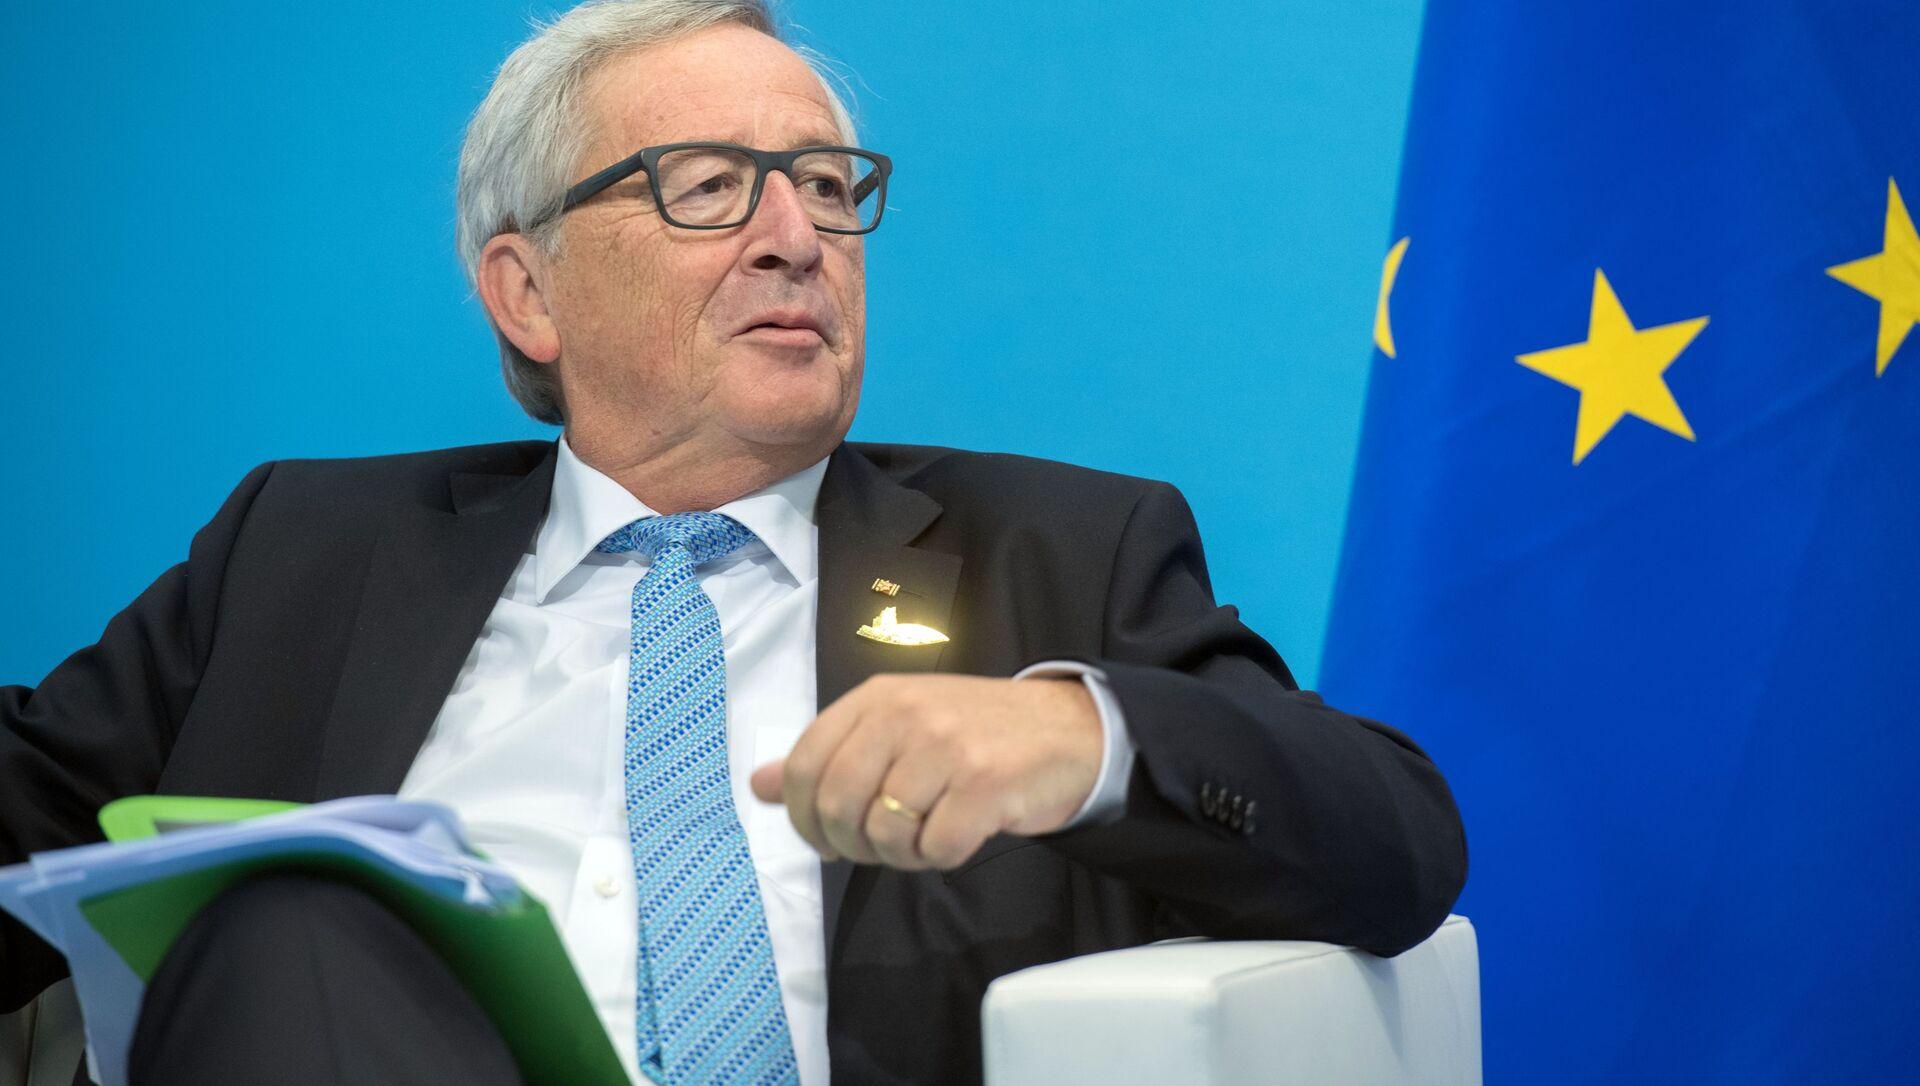 Ora basta! L'UE dice addio al dollaro - Sputnik Italia, 1920, 07.02.2021